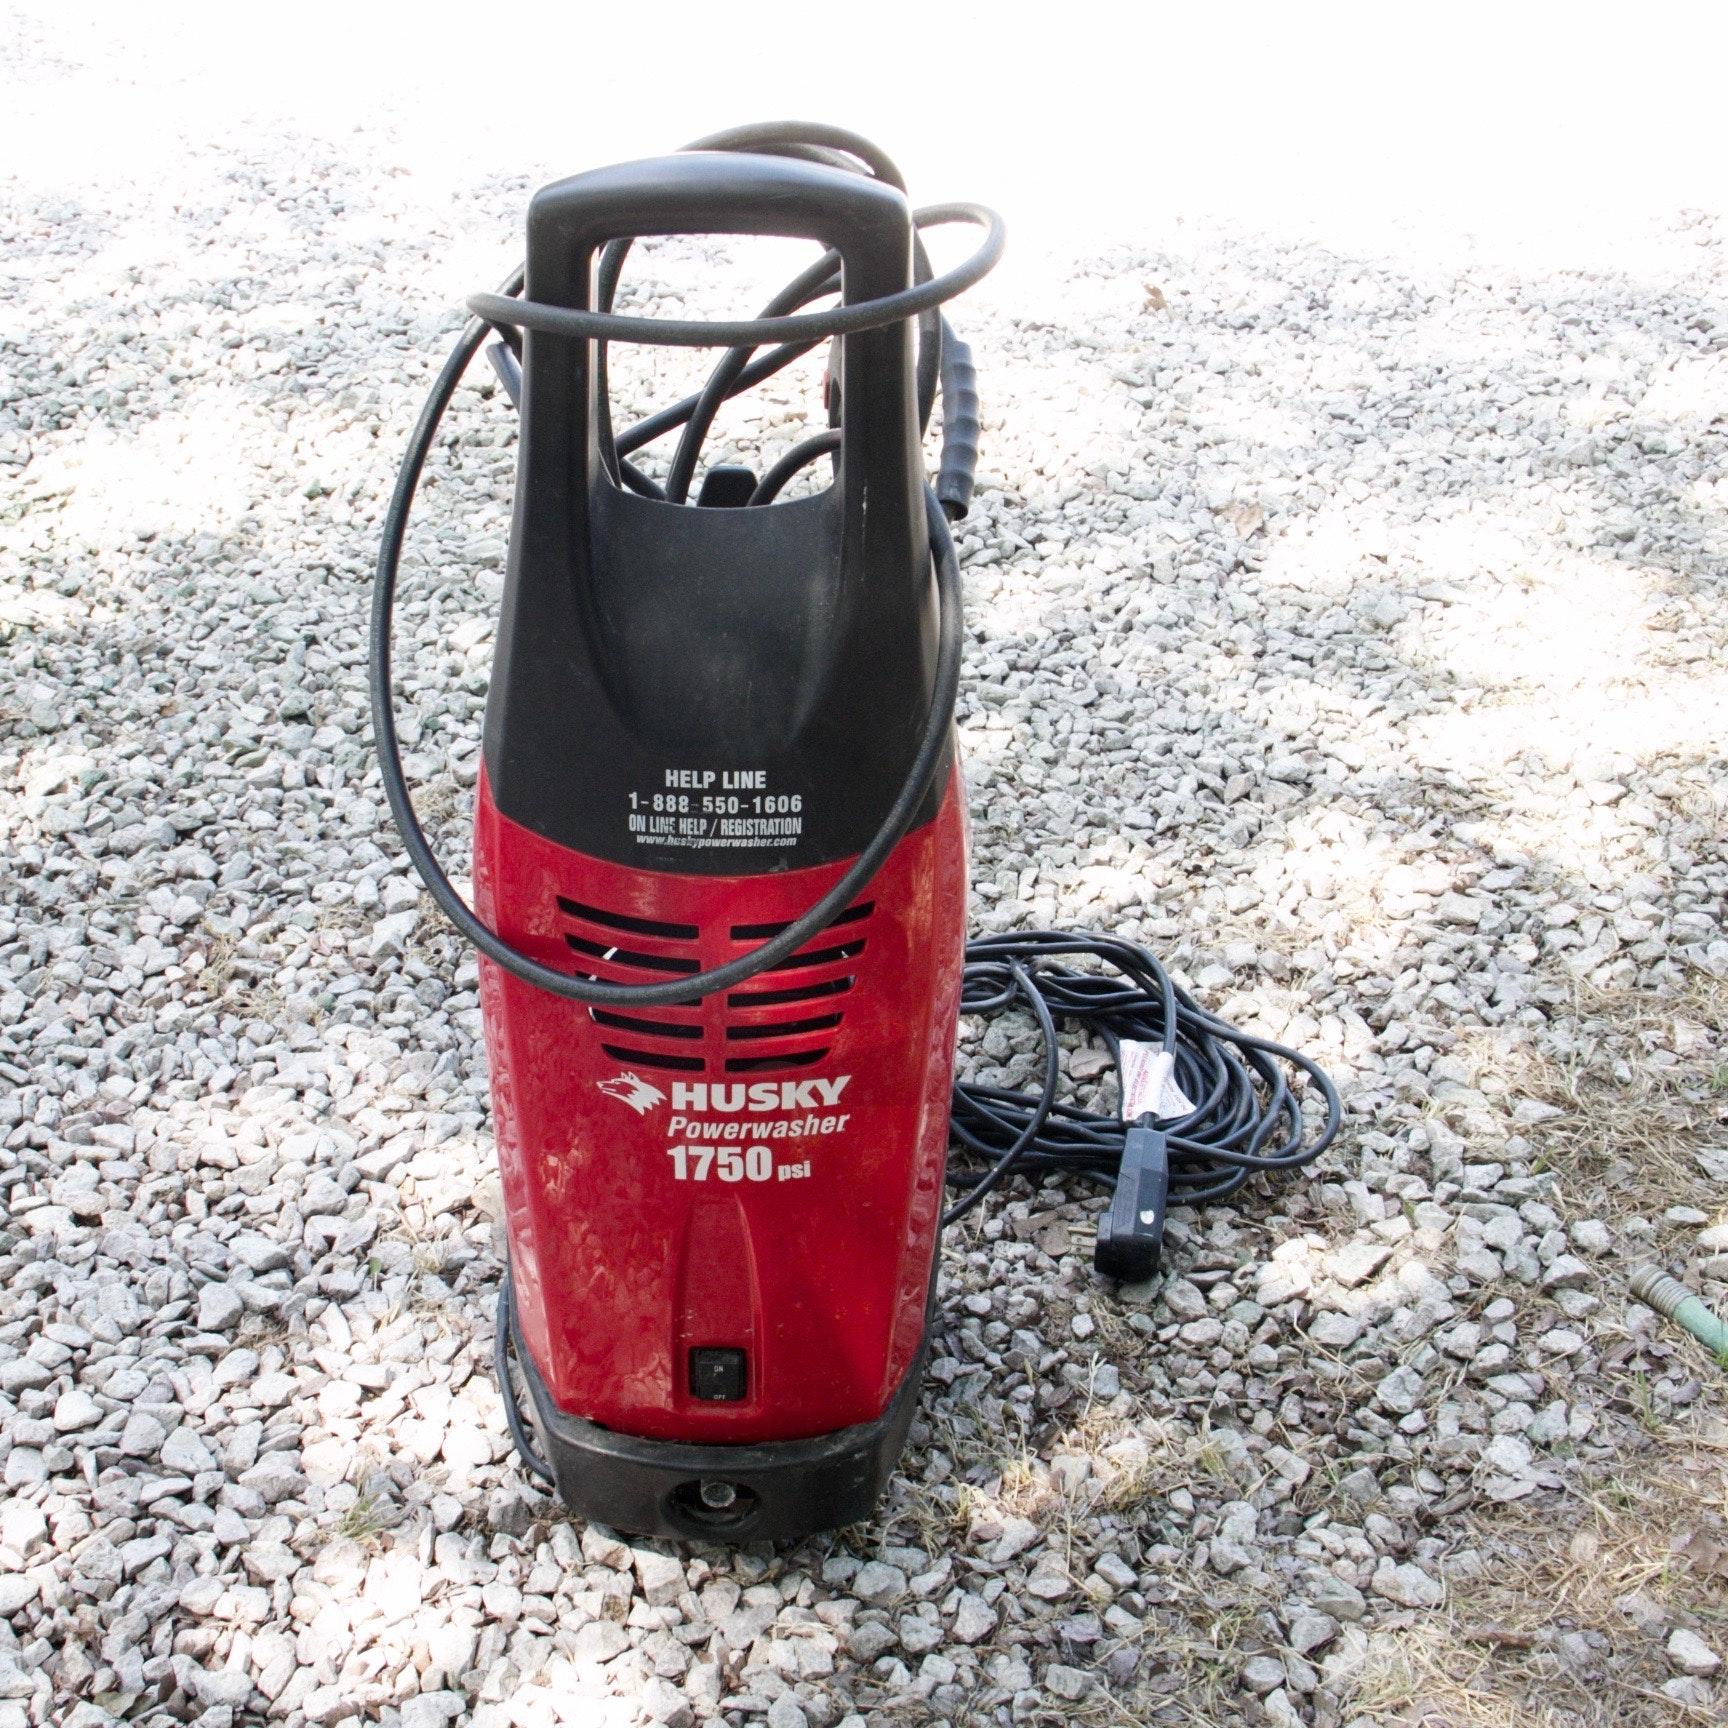 Husky Power Washer 1750 Ebth